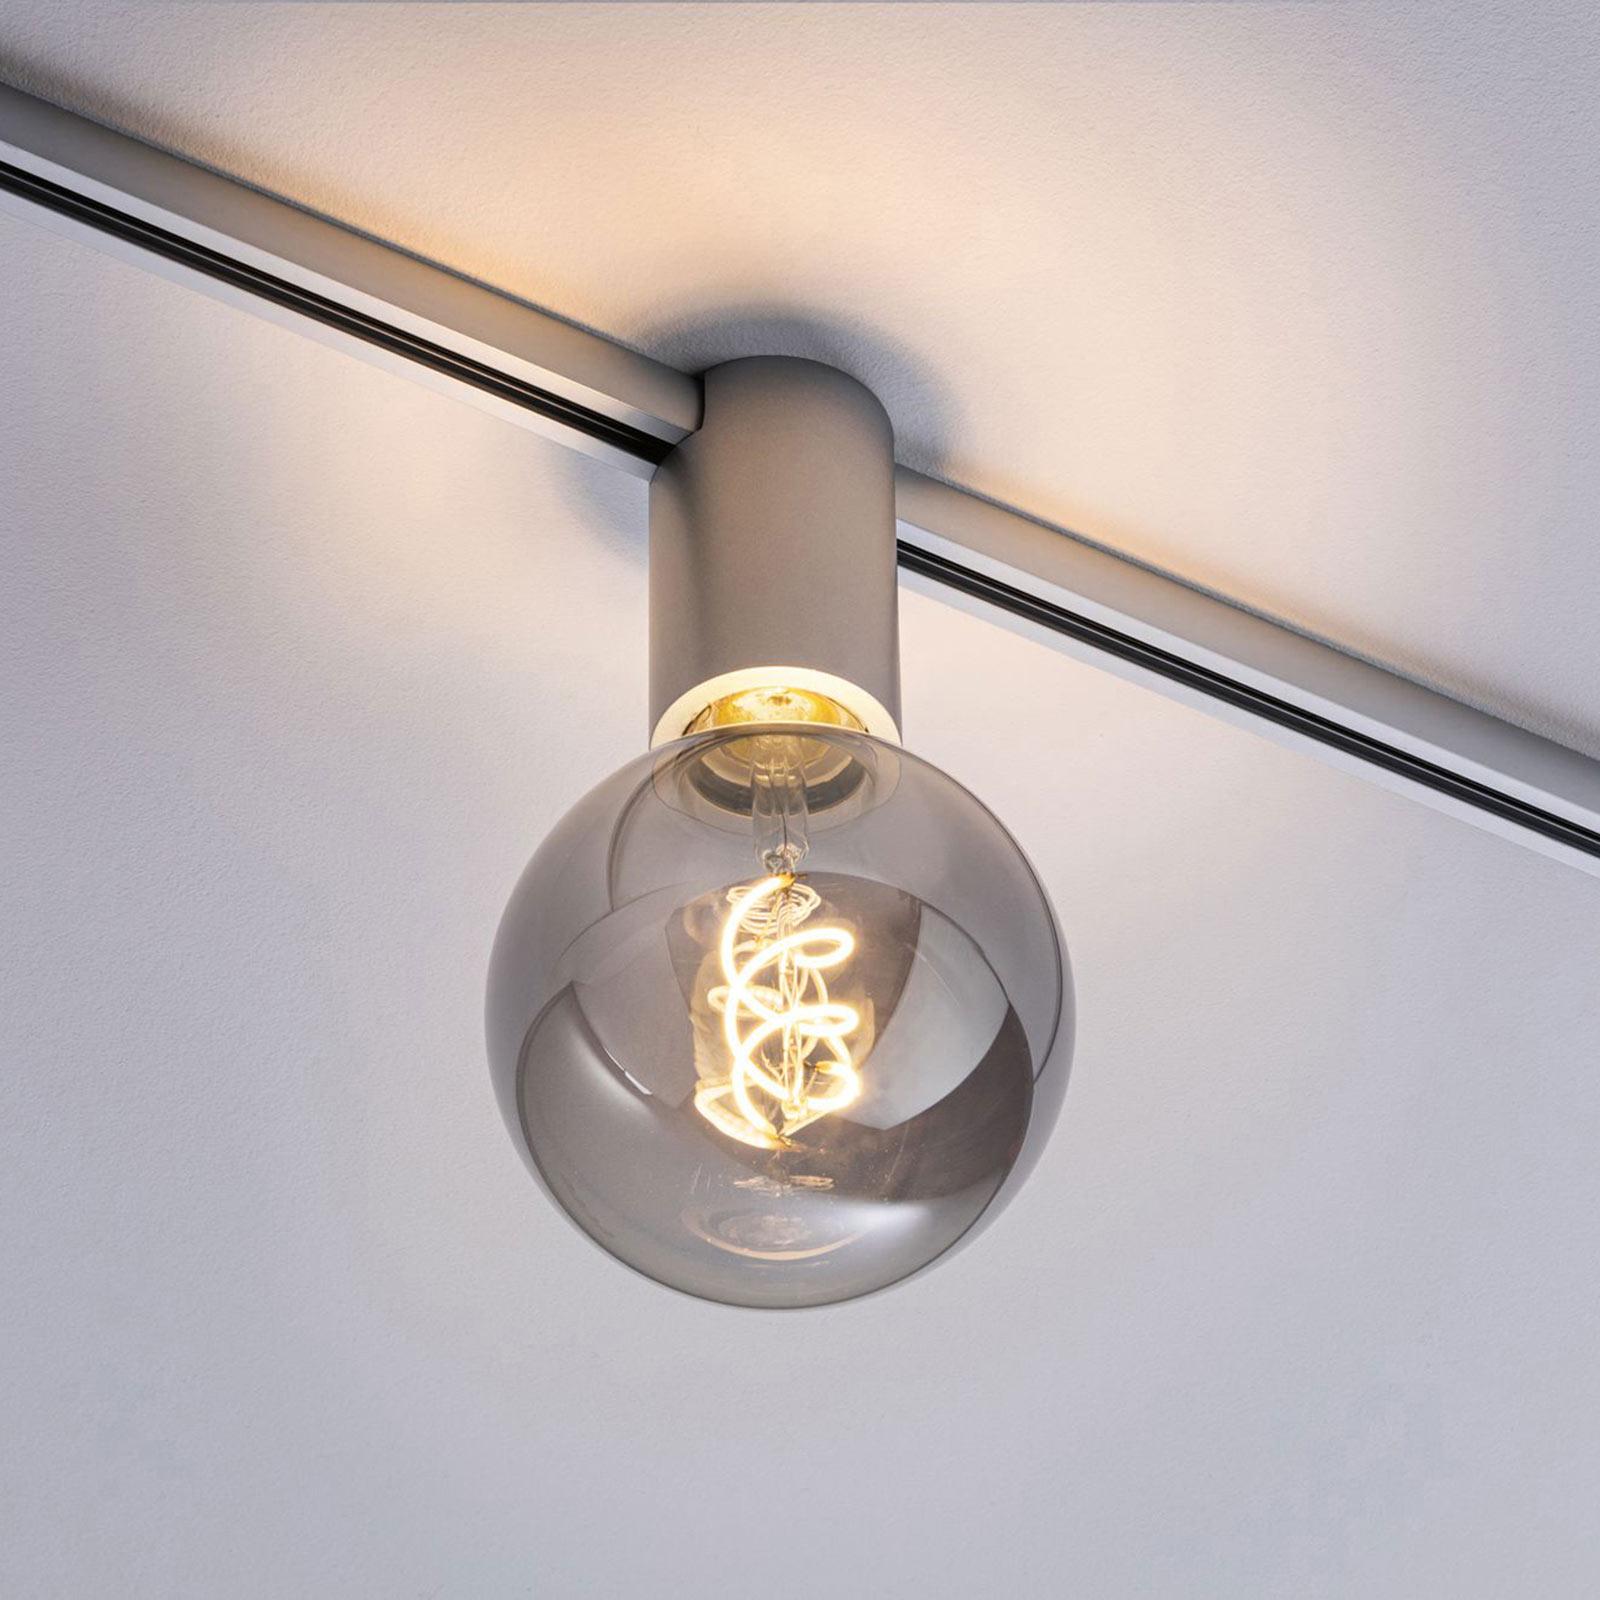 Paulmann URail Ceiling Socket E27, cromo satinato Offerte e sconti